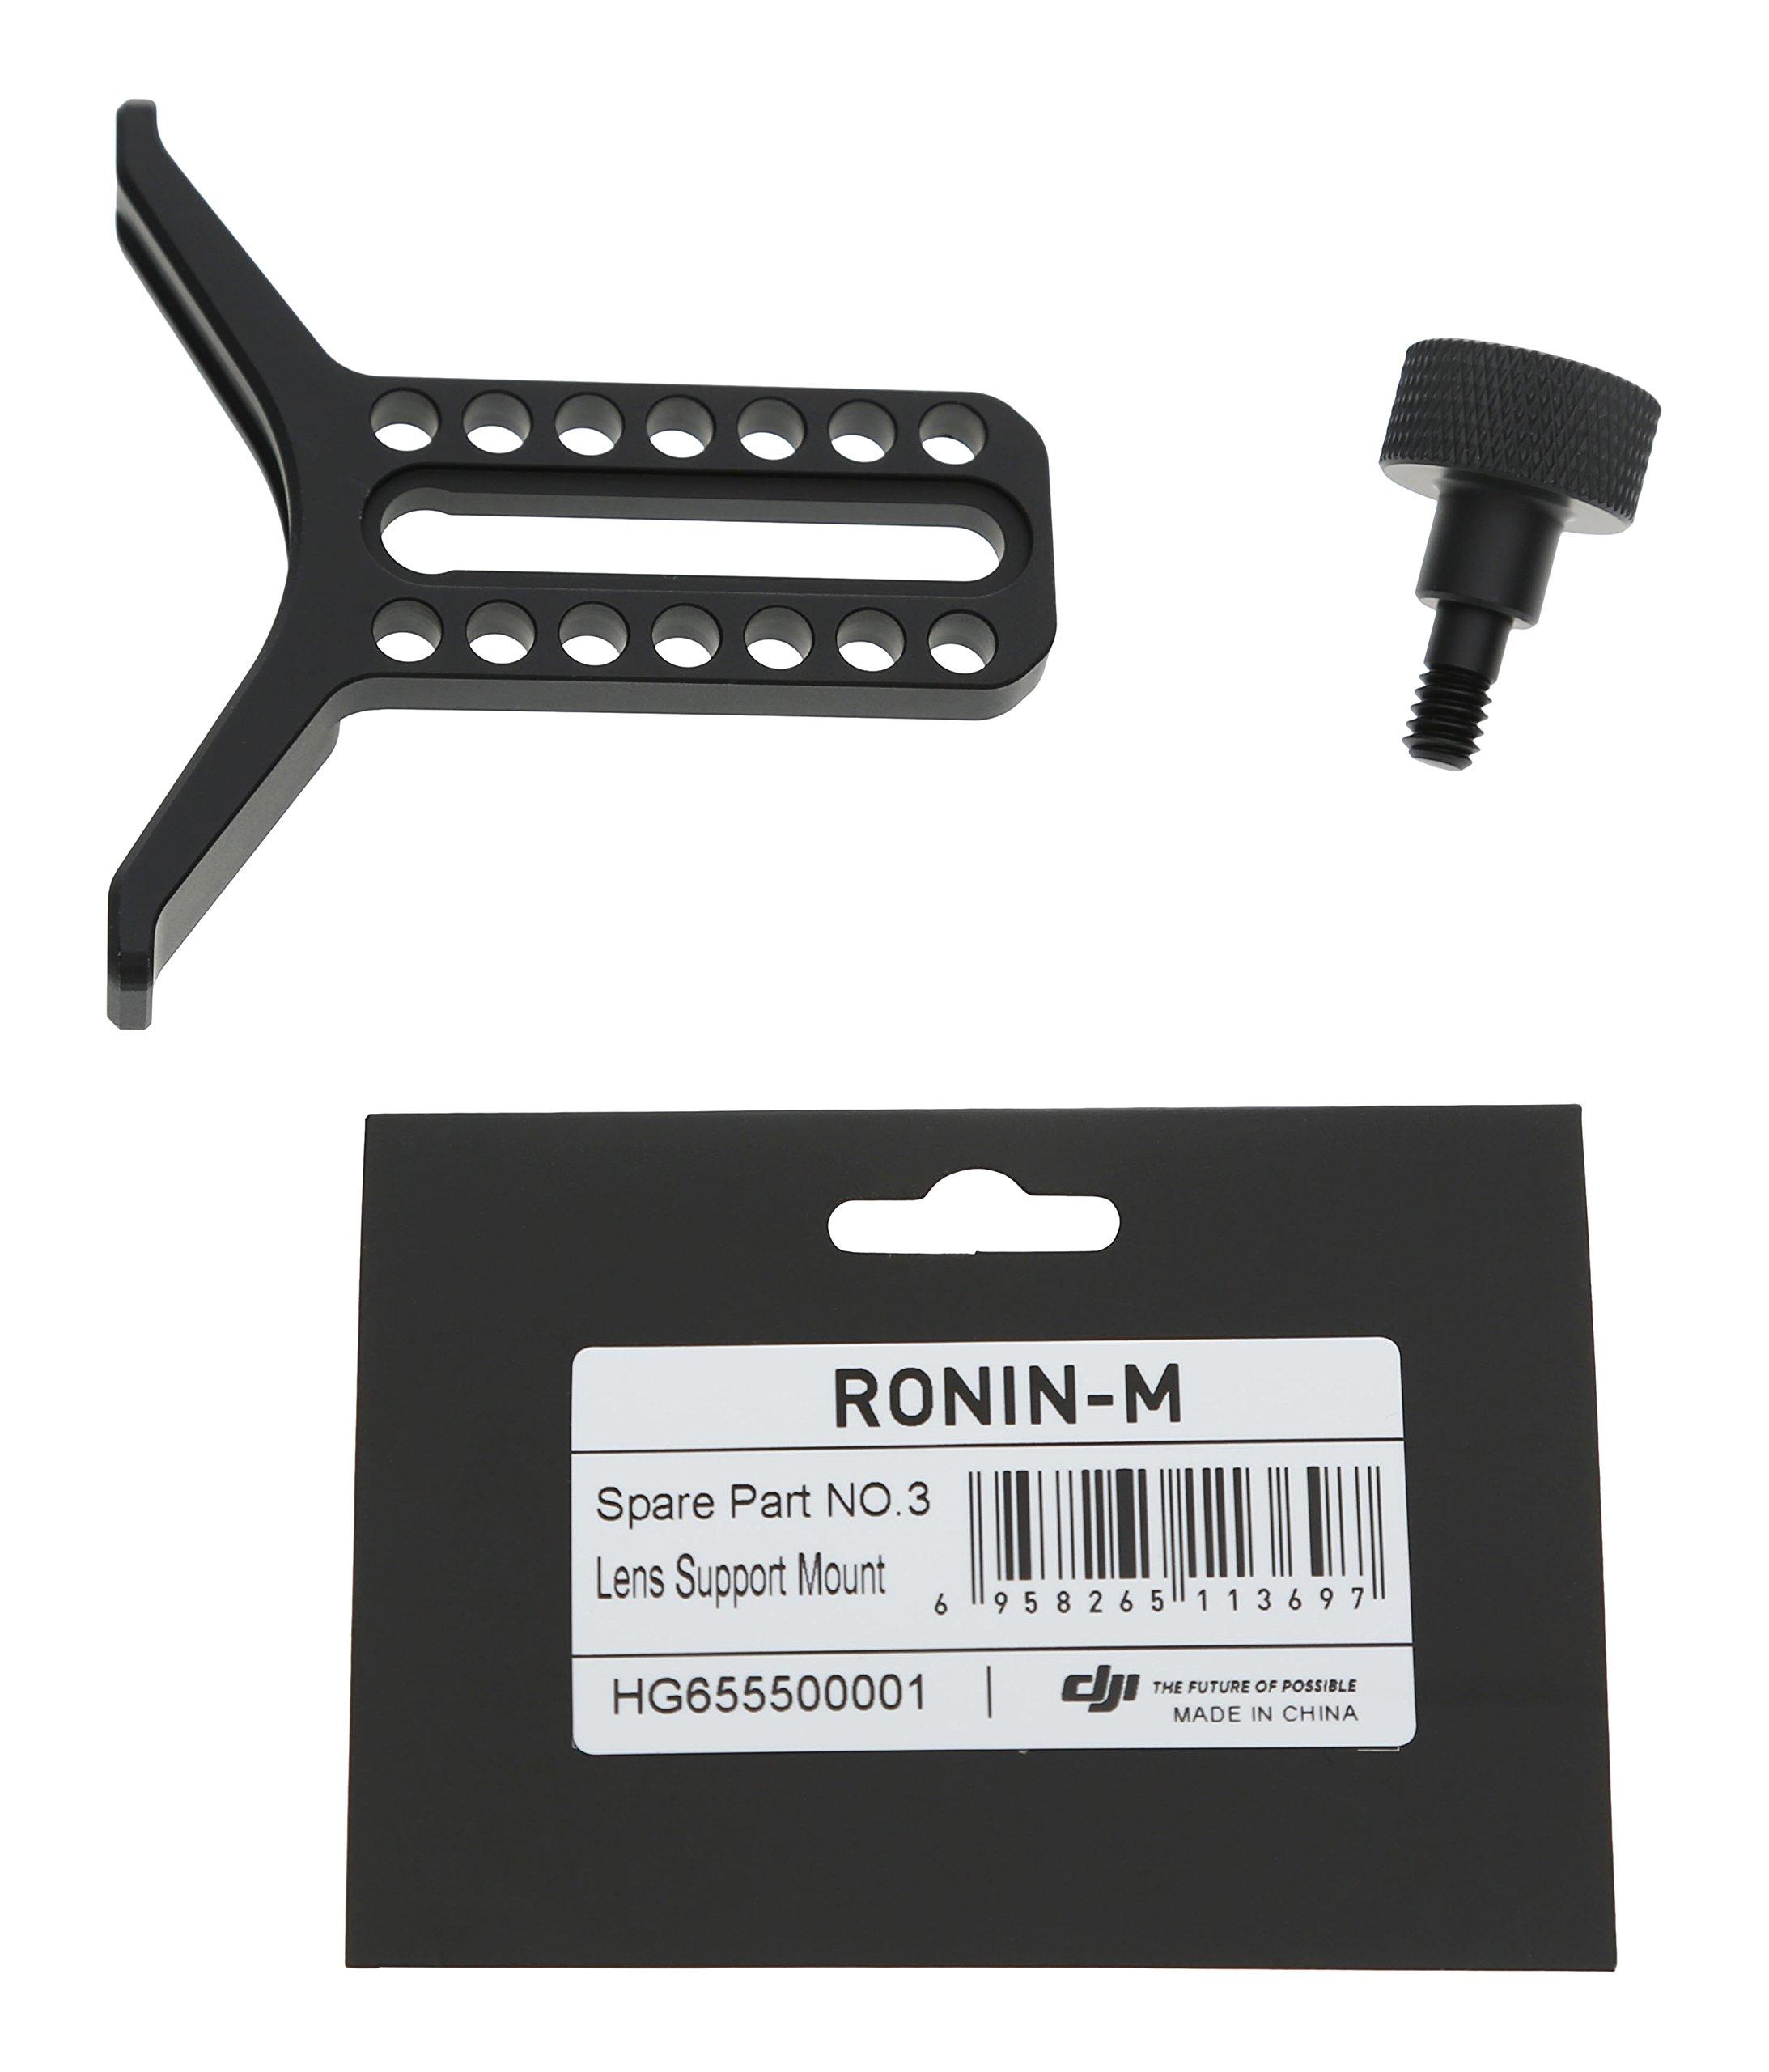 DJI Ronin M Lens Support Mount by DJI